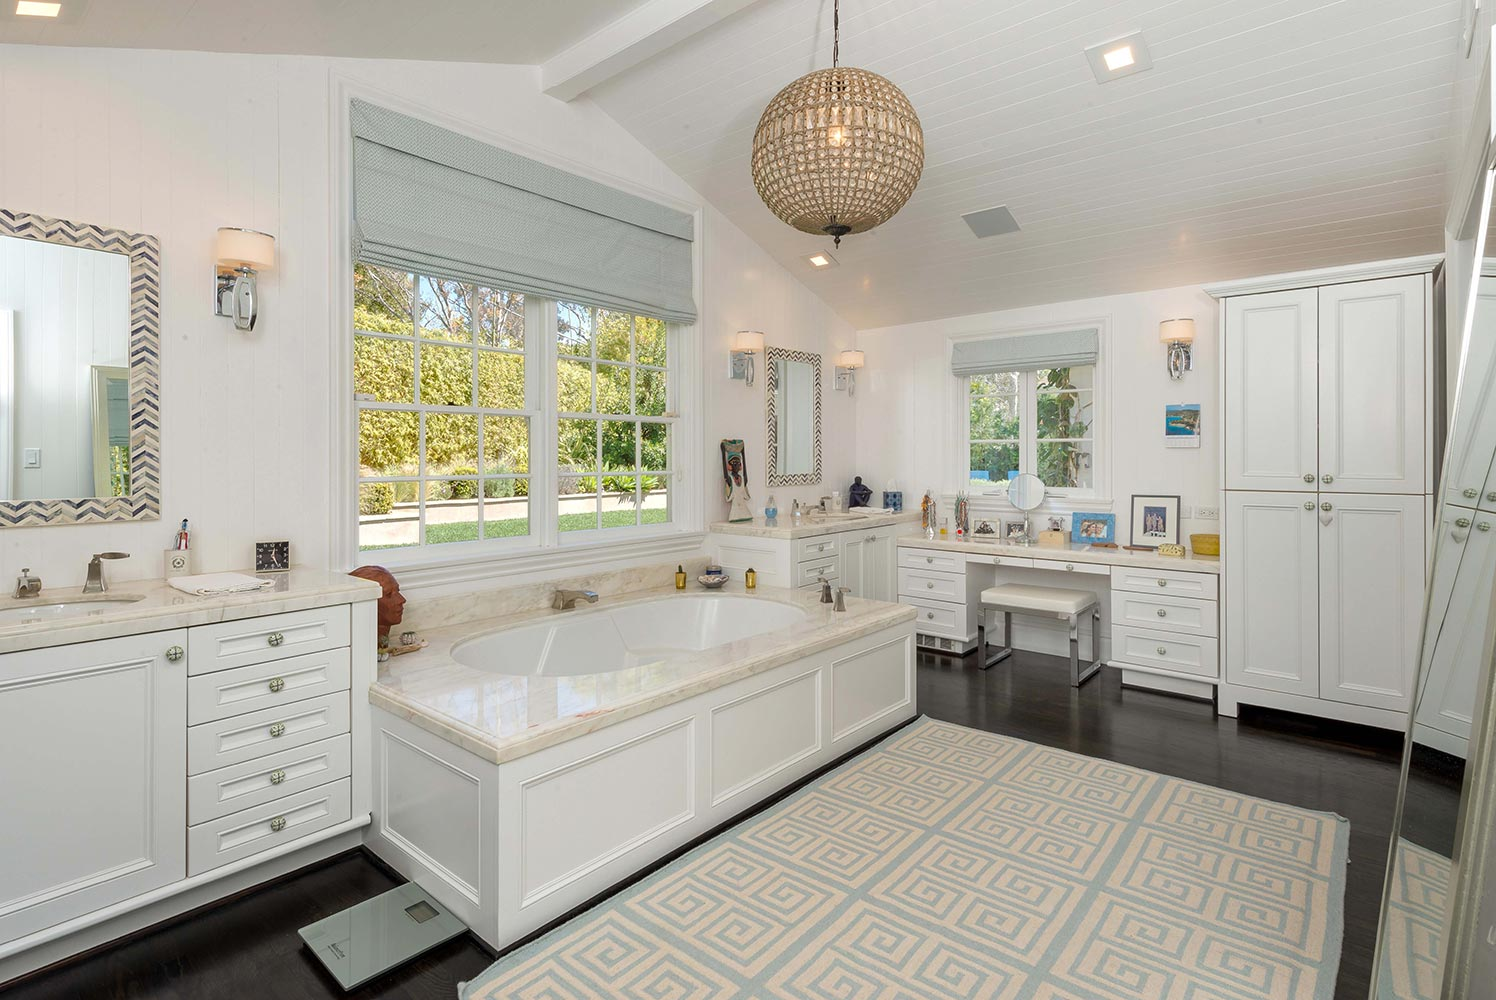 1224 Villa Woods Dr,Pacific Palisades,California 90272,4 Bedrooms Bedrooms,3.5 BathroomsBathrooms,Home,Villa Woods Dr,1026